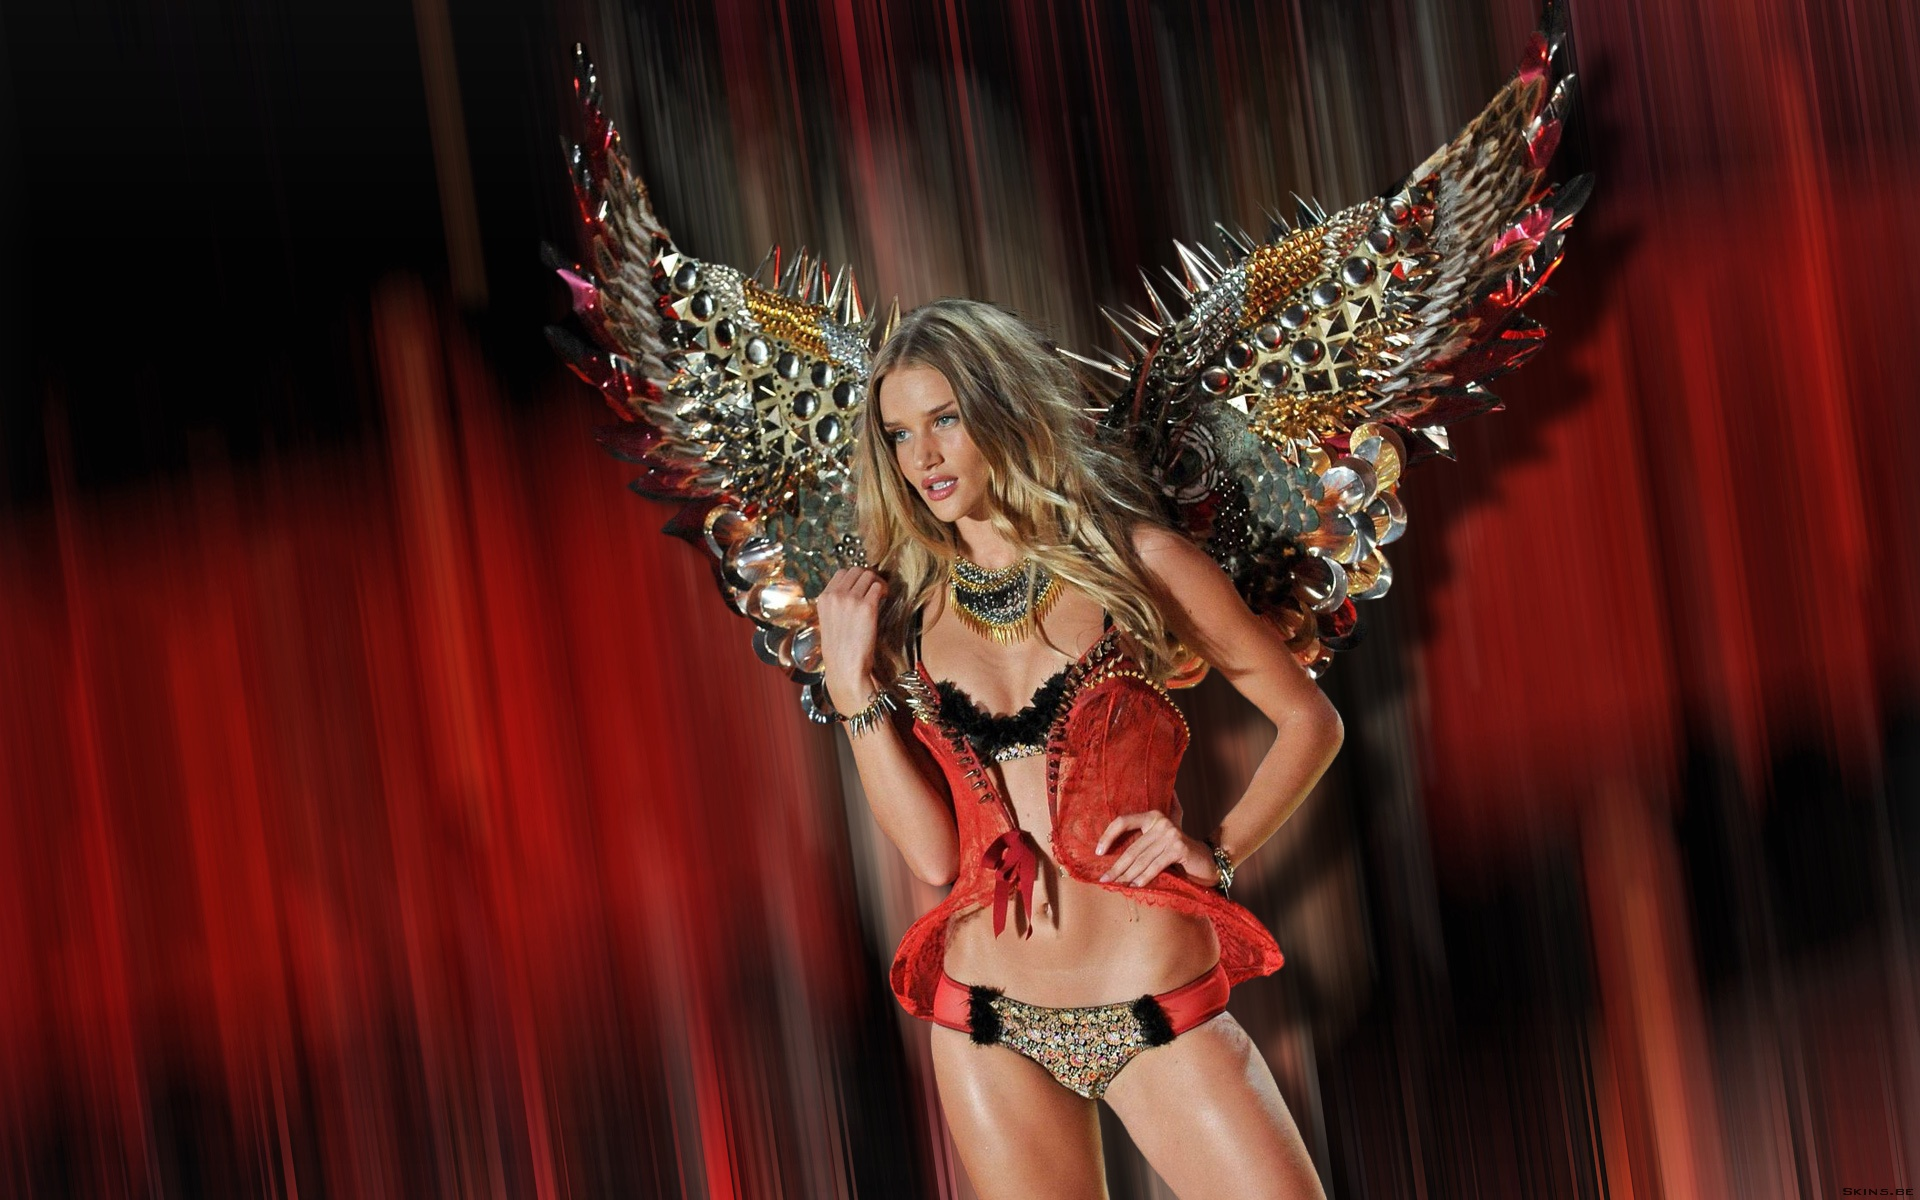 Rosie Huntington Whiteley Victoria S Secret 2012 Wallpaper